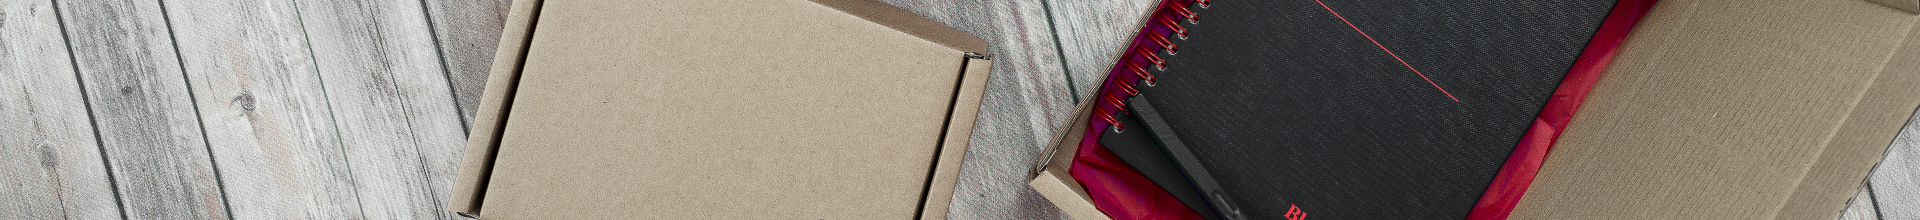 Kraft Brown Flat Packed Postal Boxes